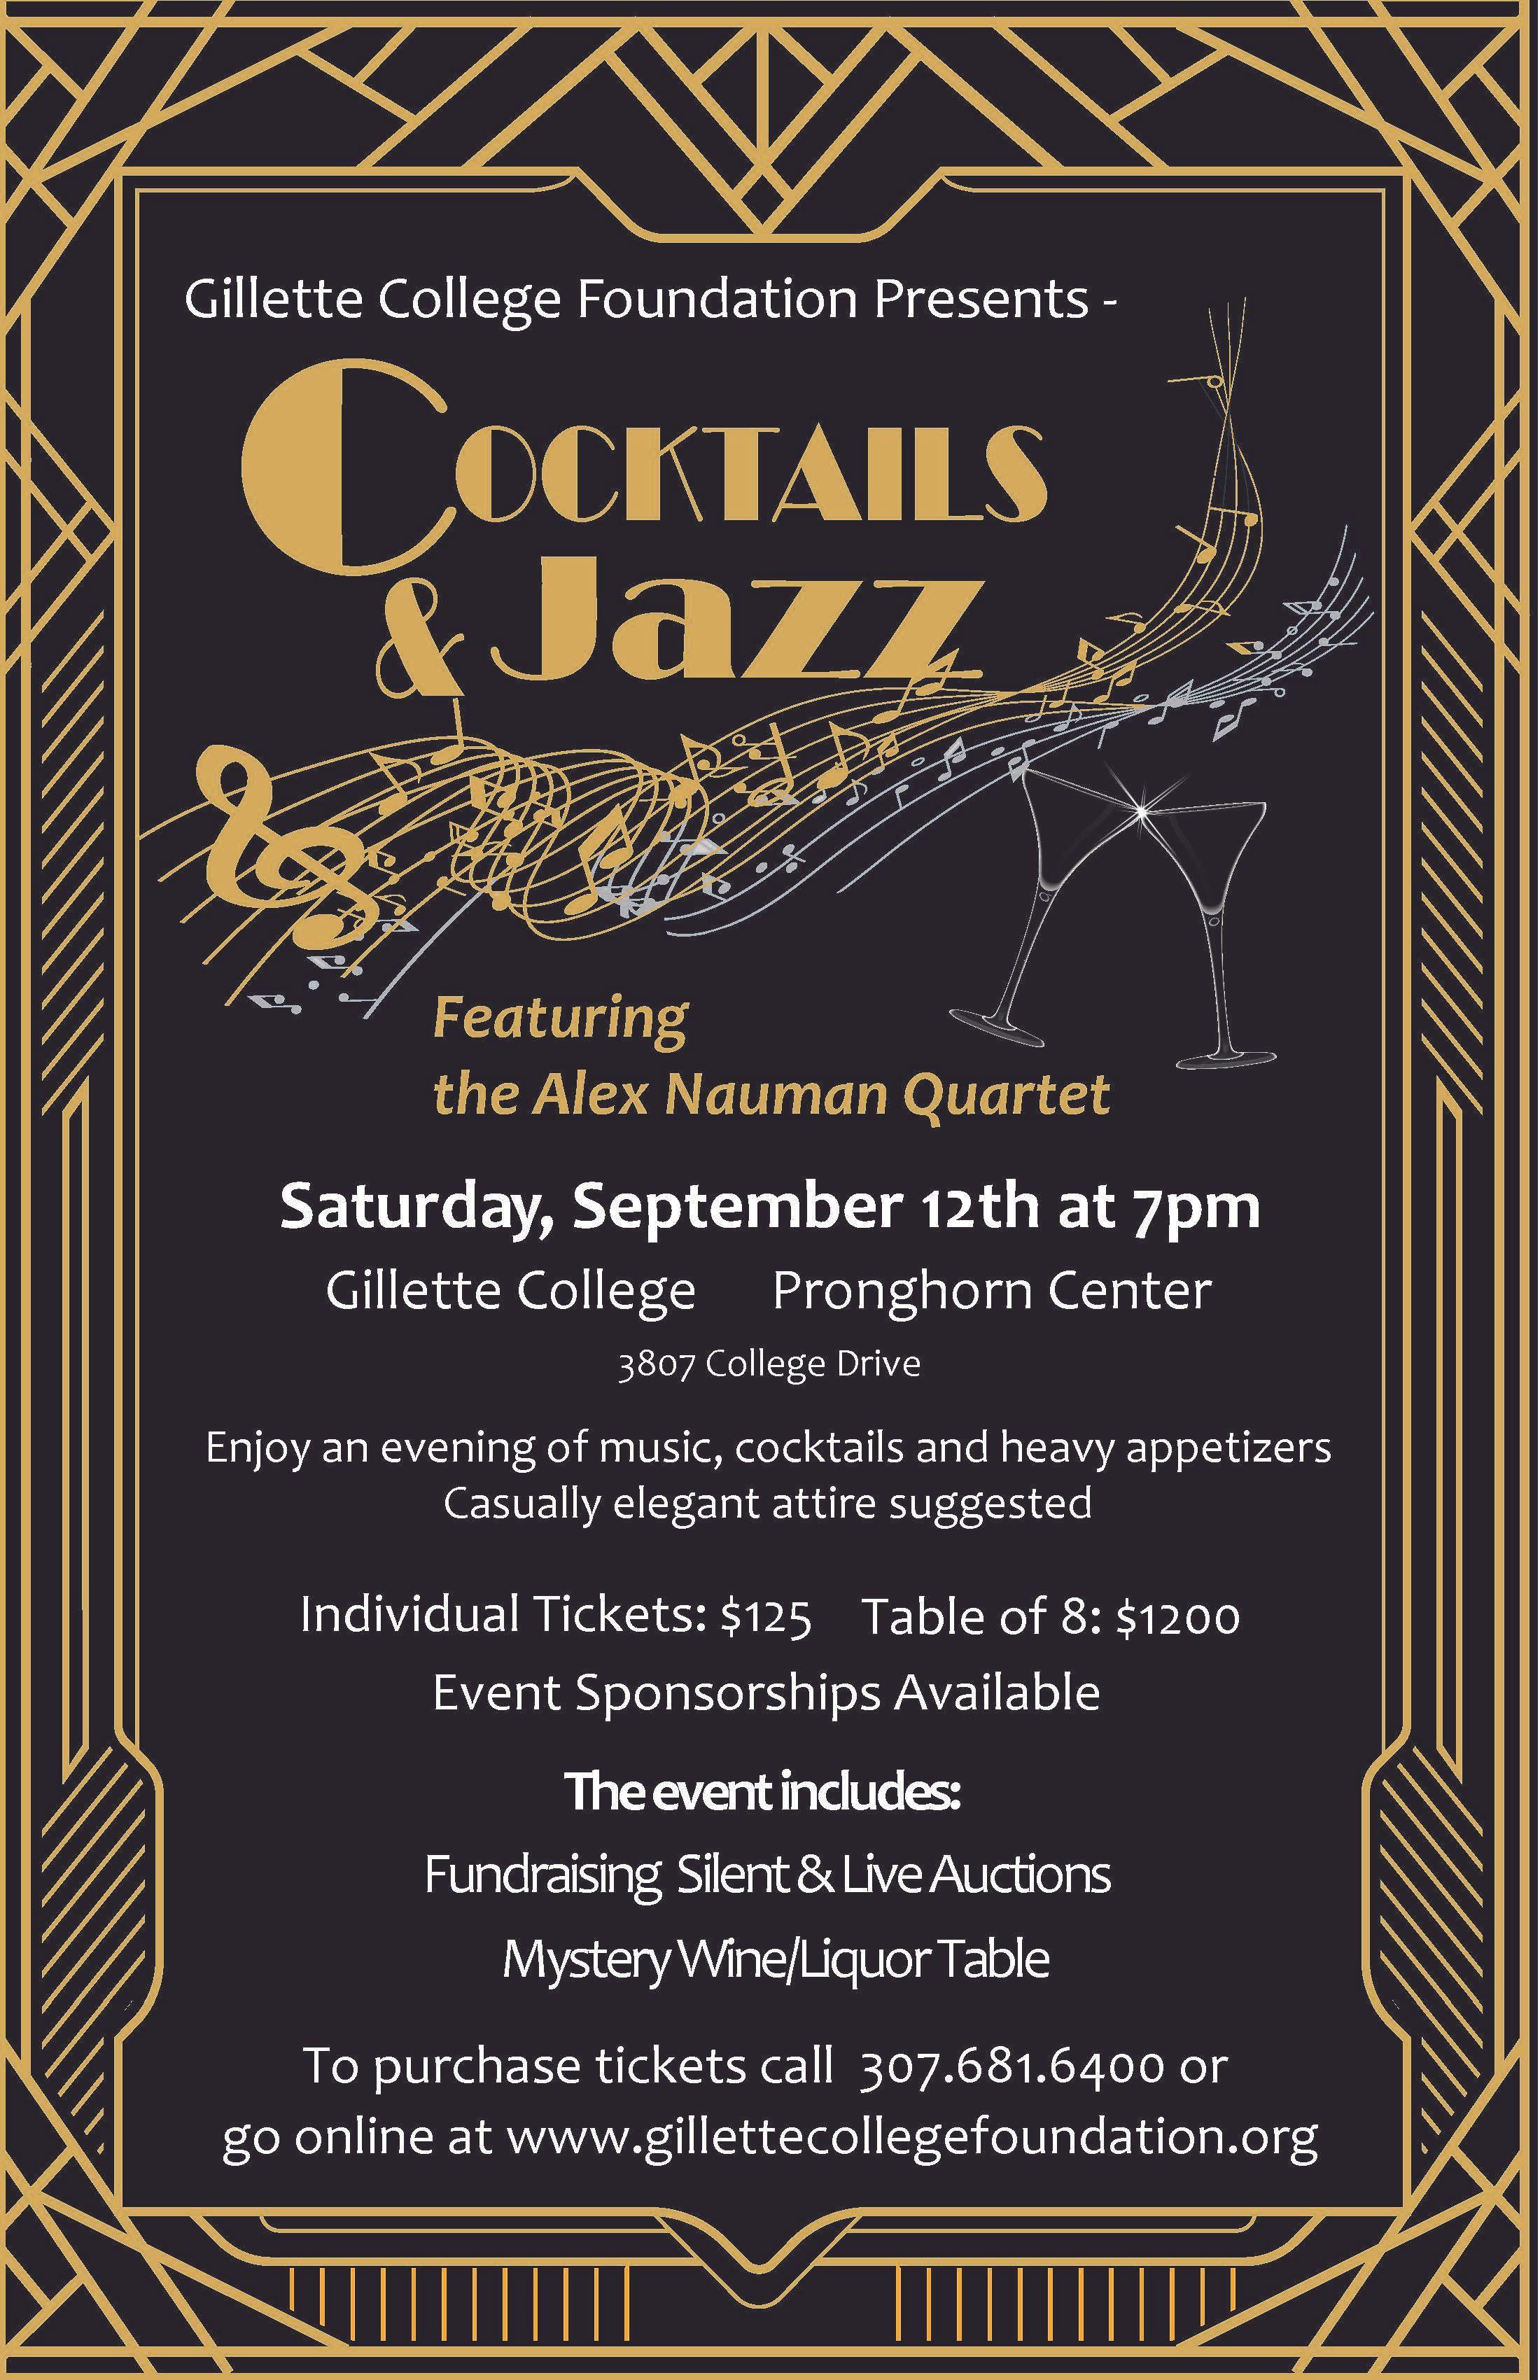 Cocktails & Jazz